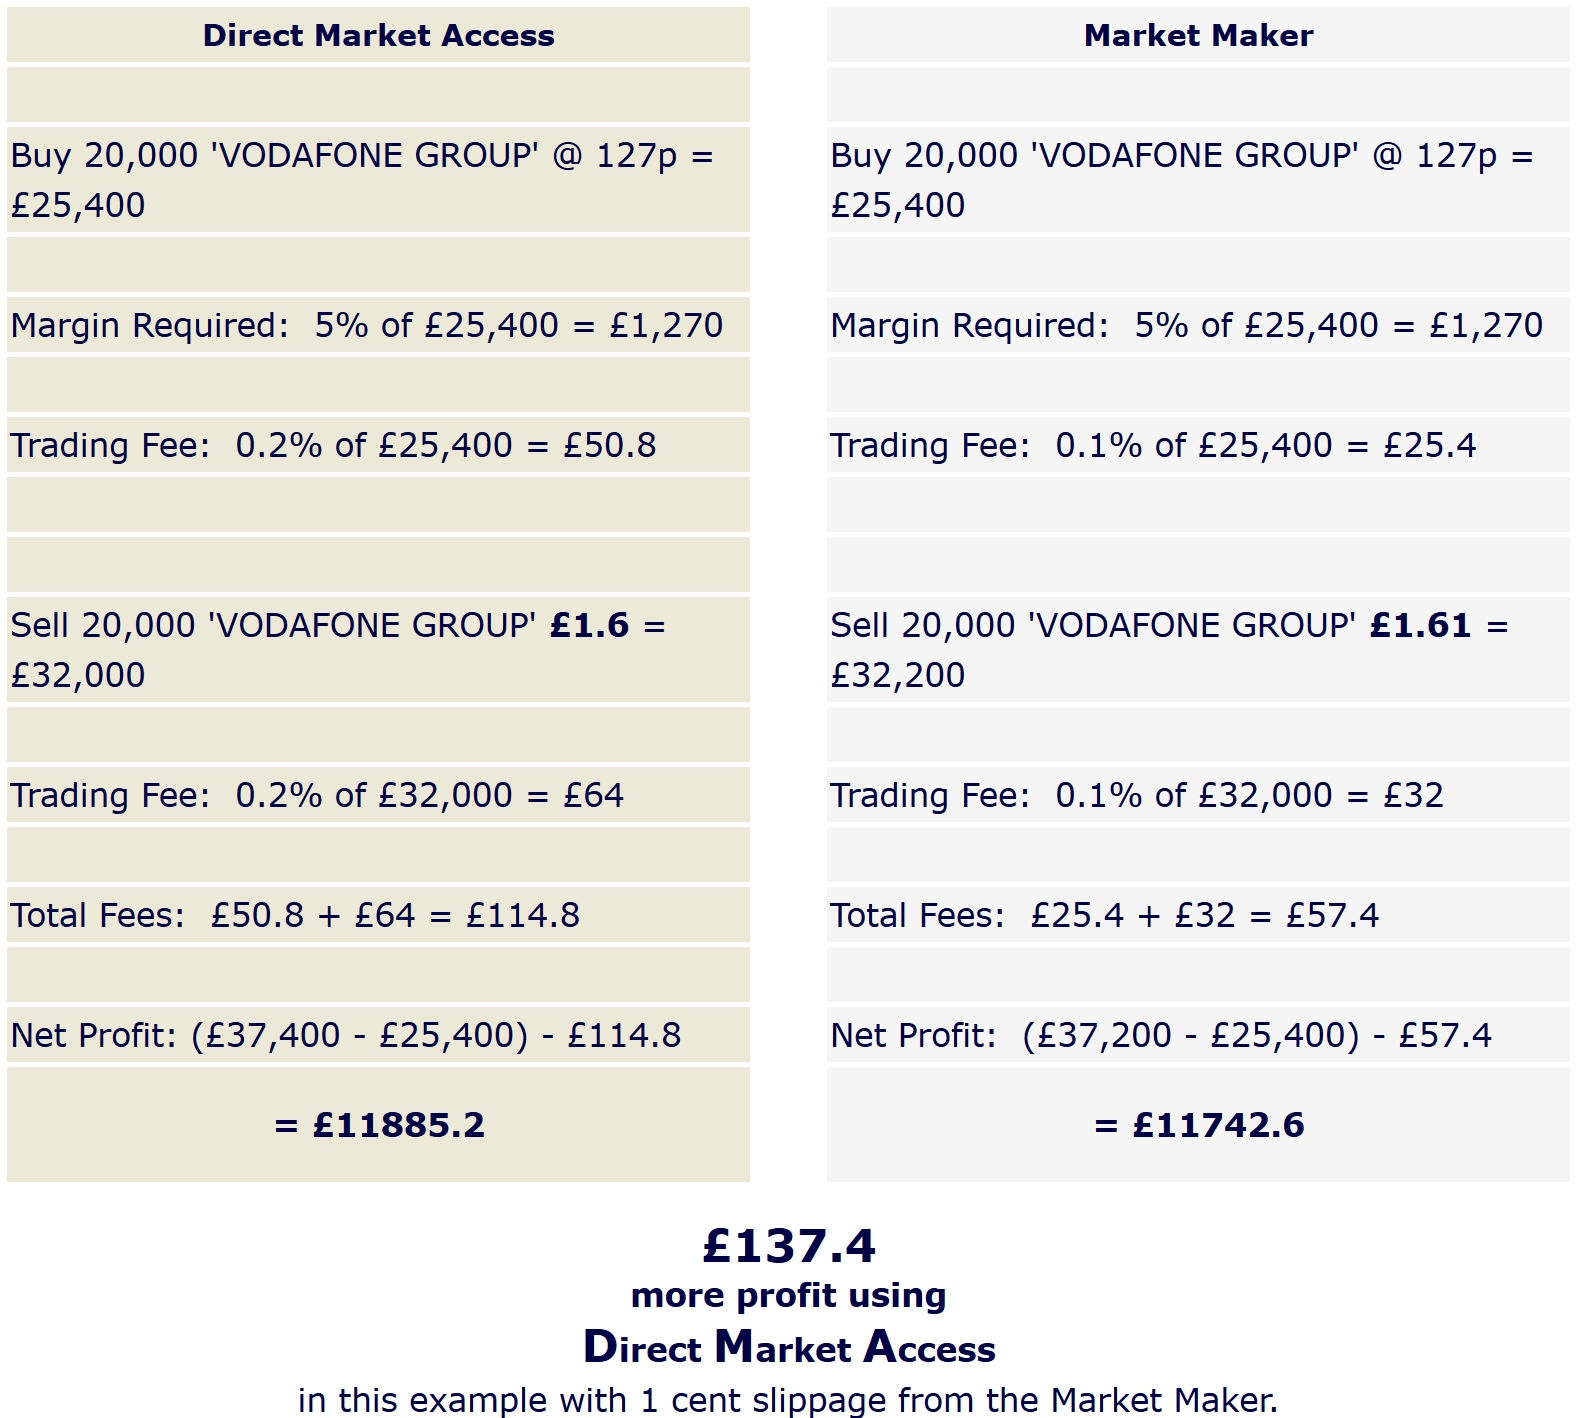 DMA vs Market Maker